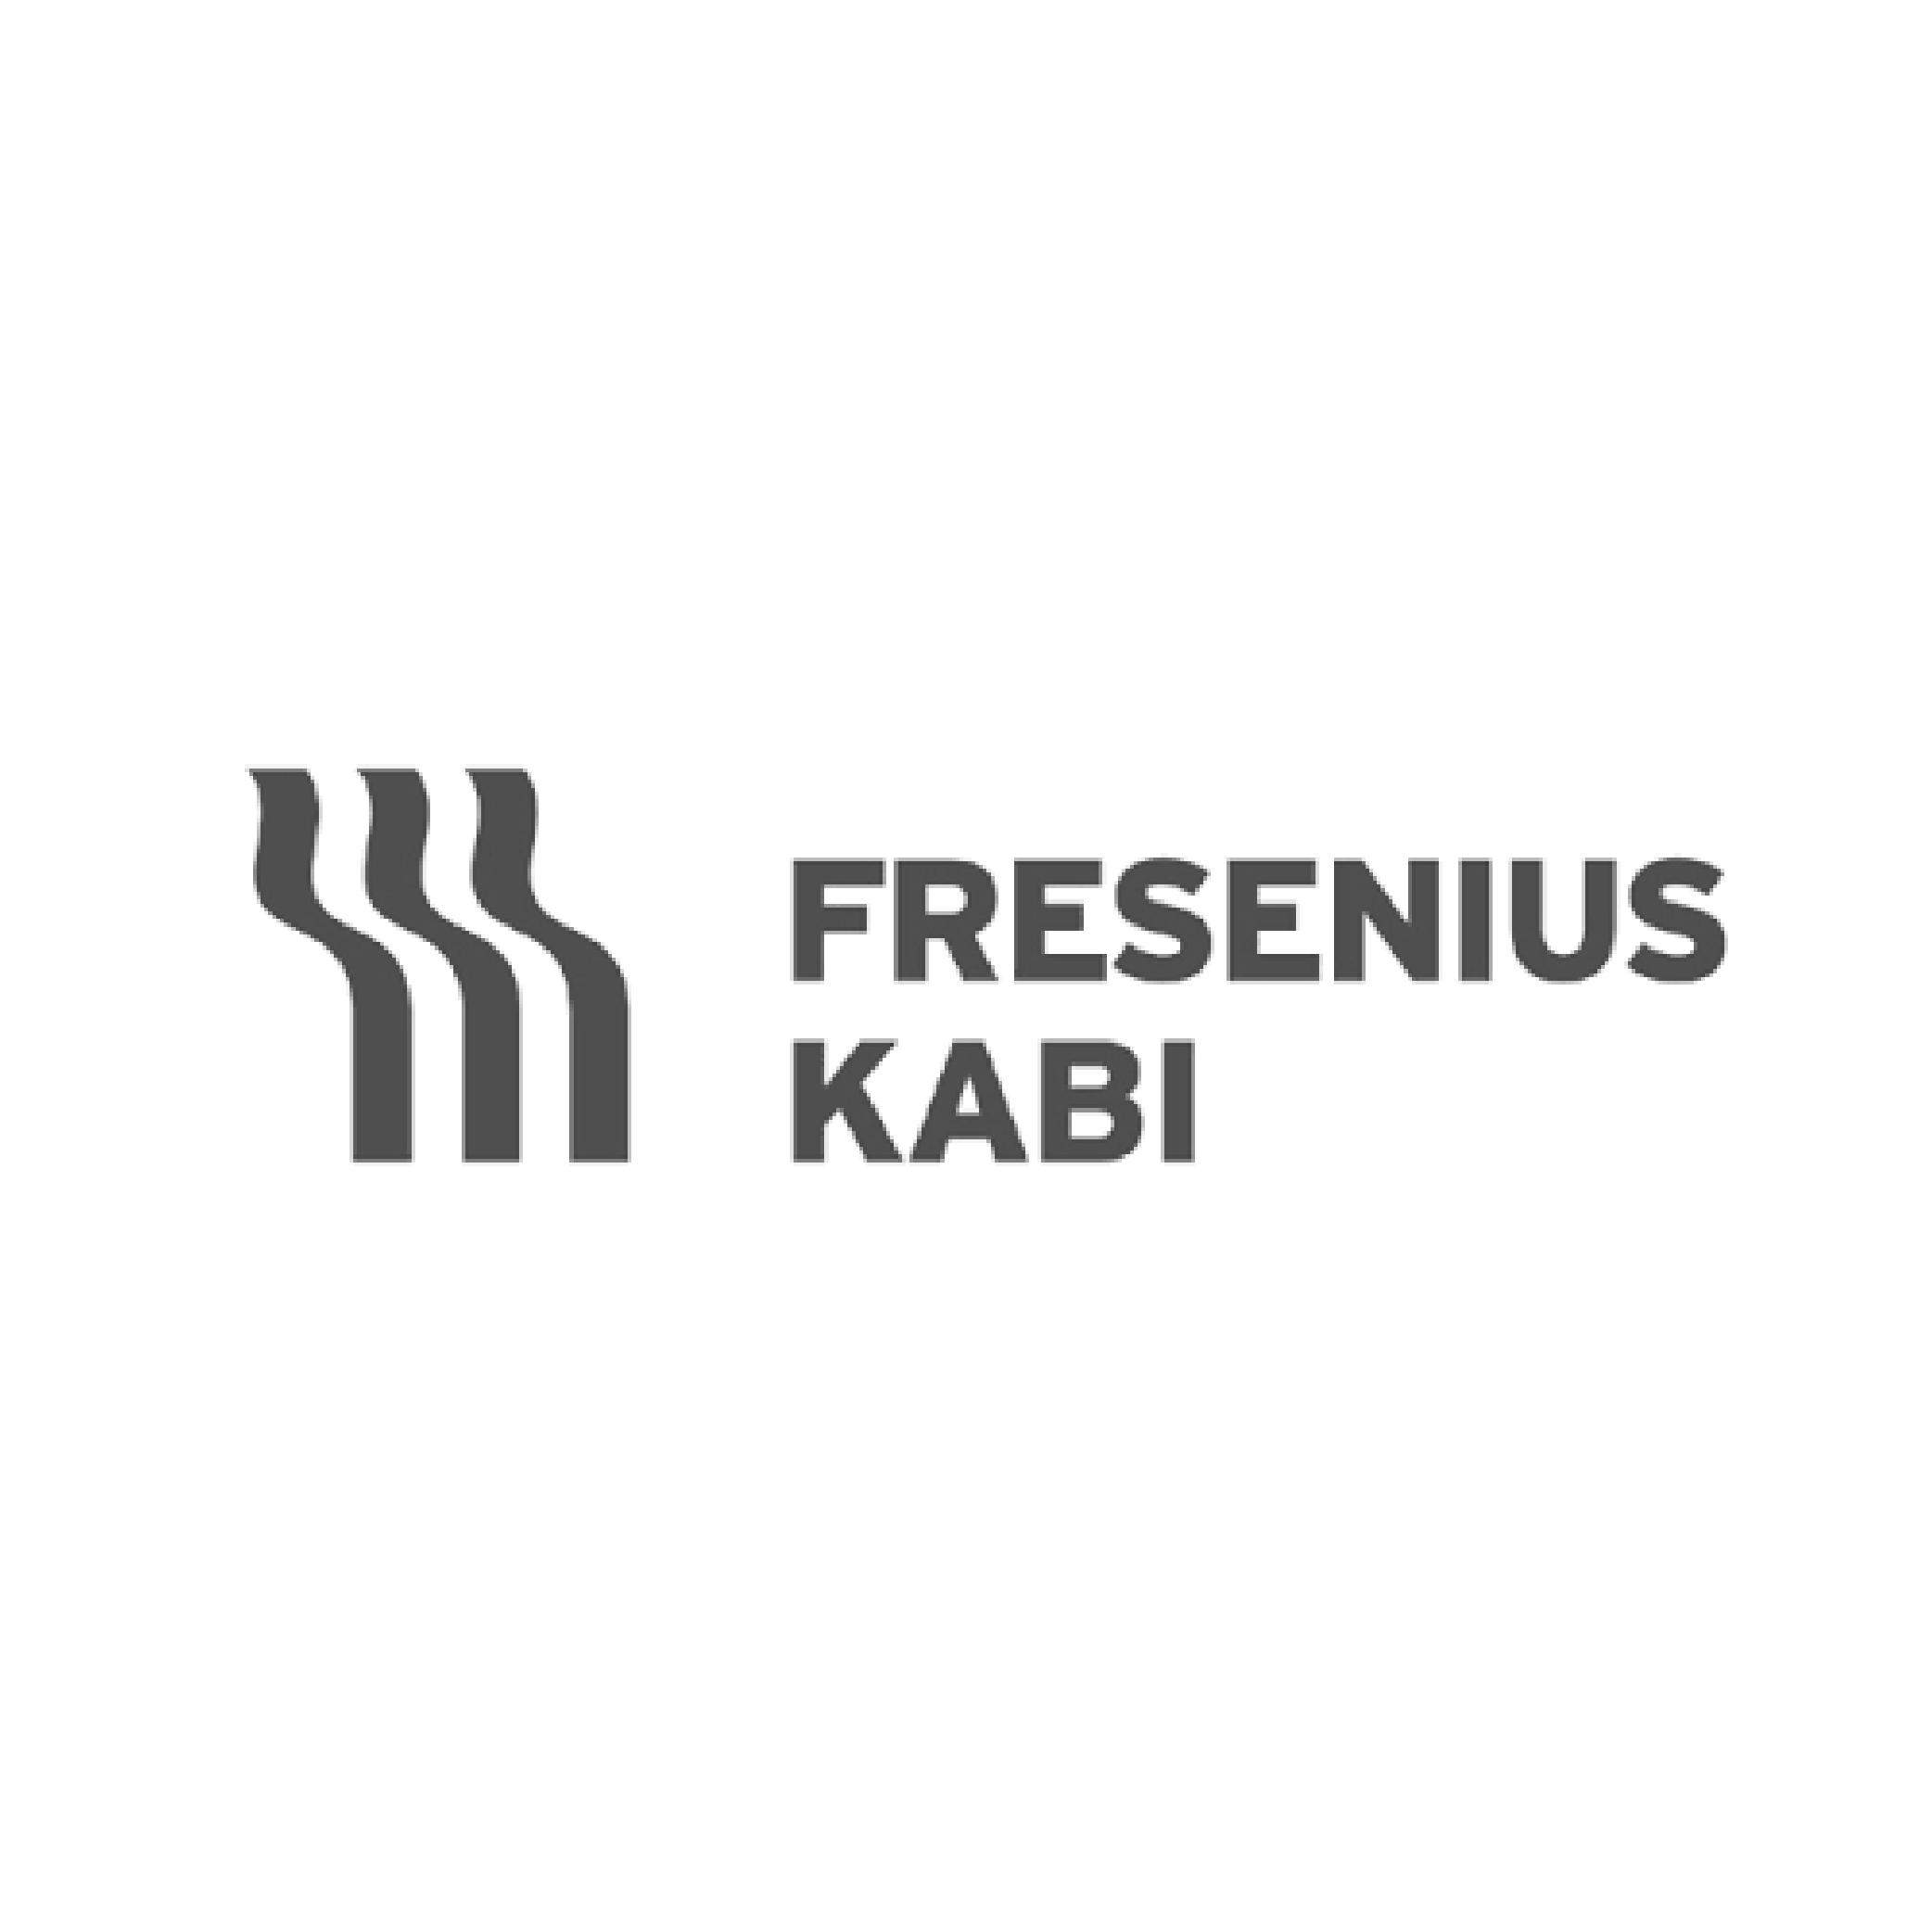 Fresnius.jpg